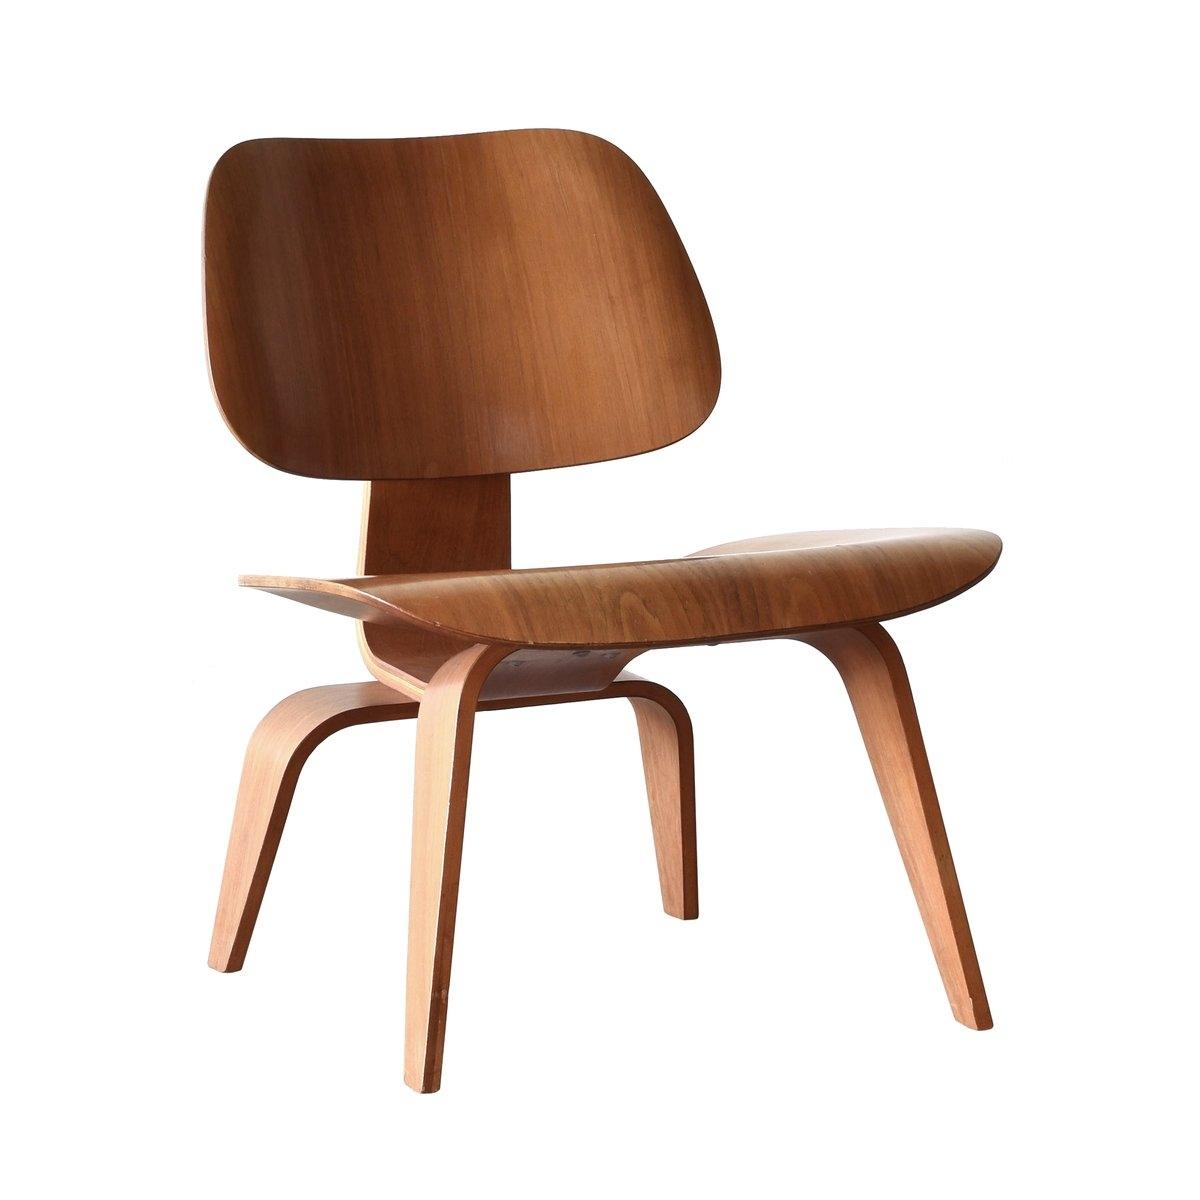 American LCW Walnut Lounge Chair By Charles U0026 Ray Eames